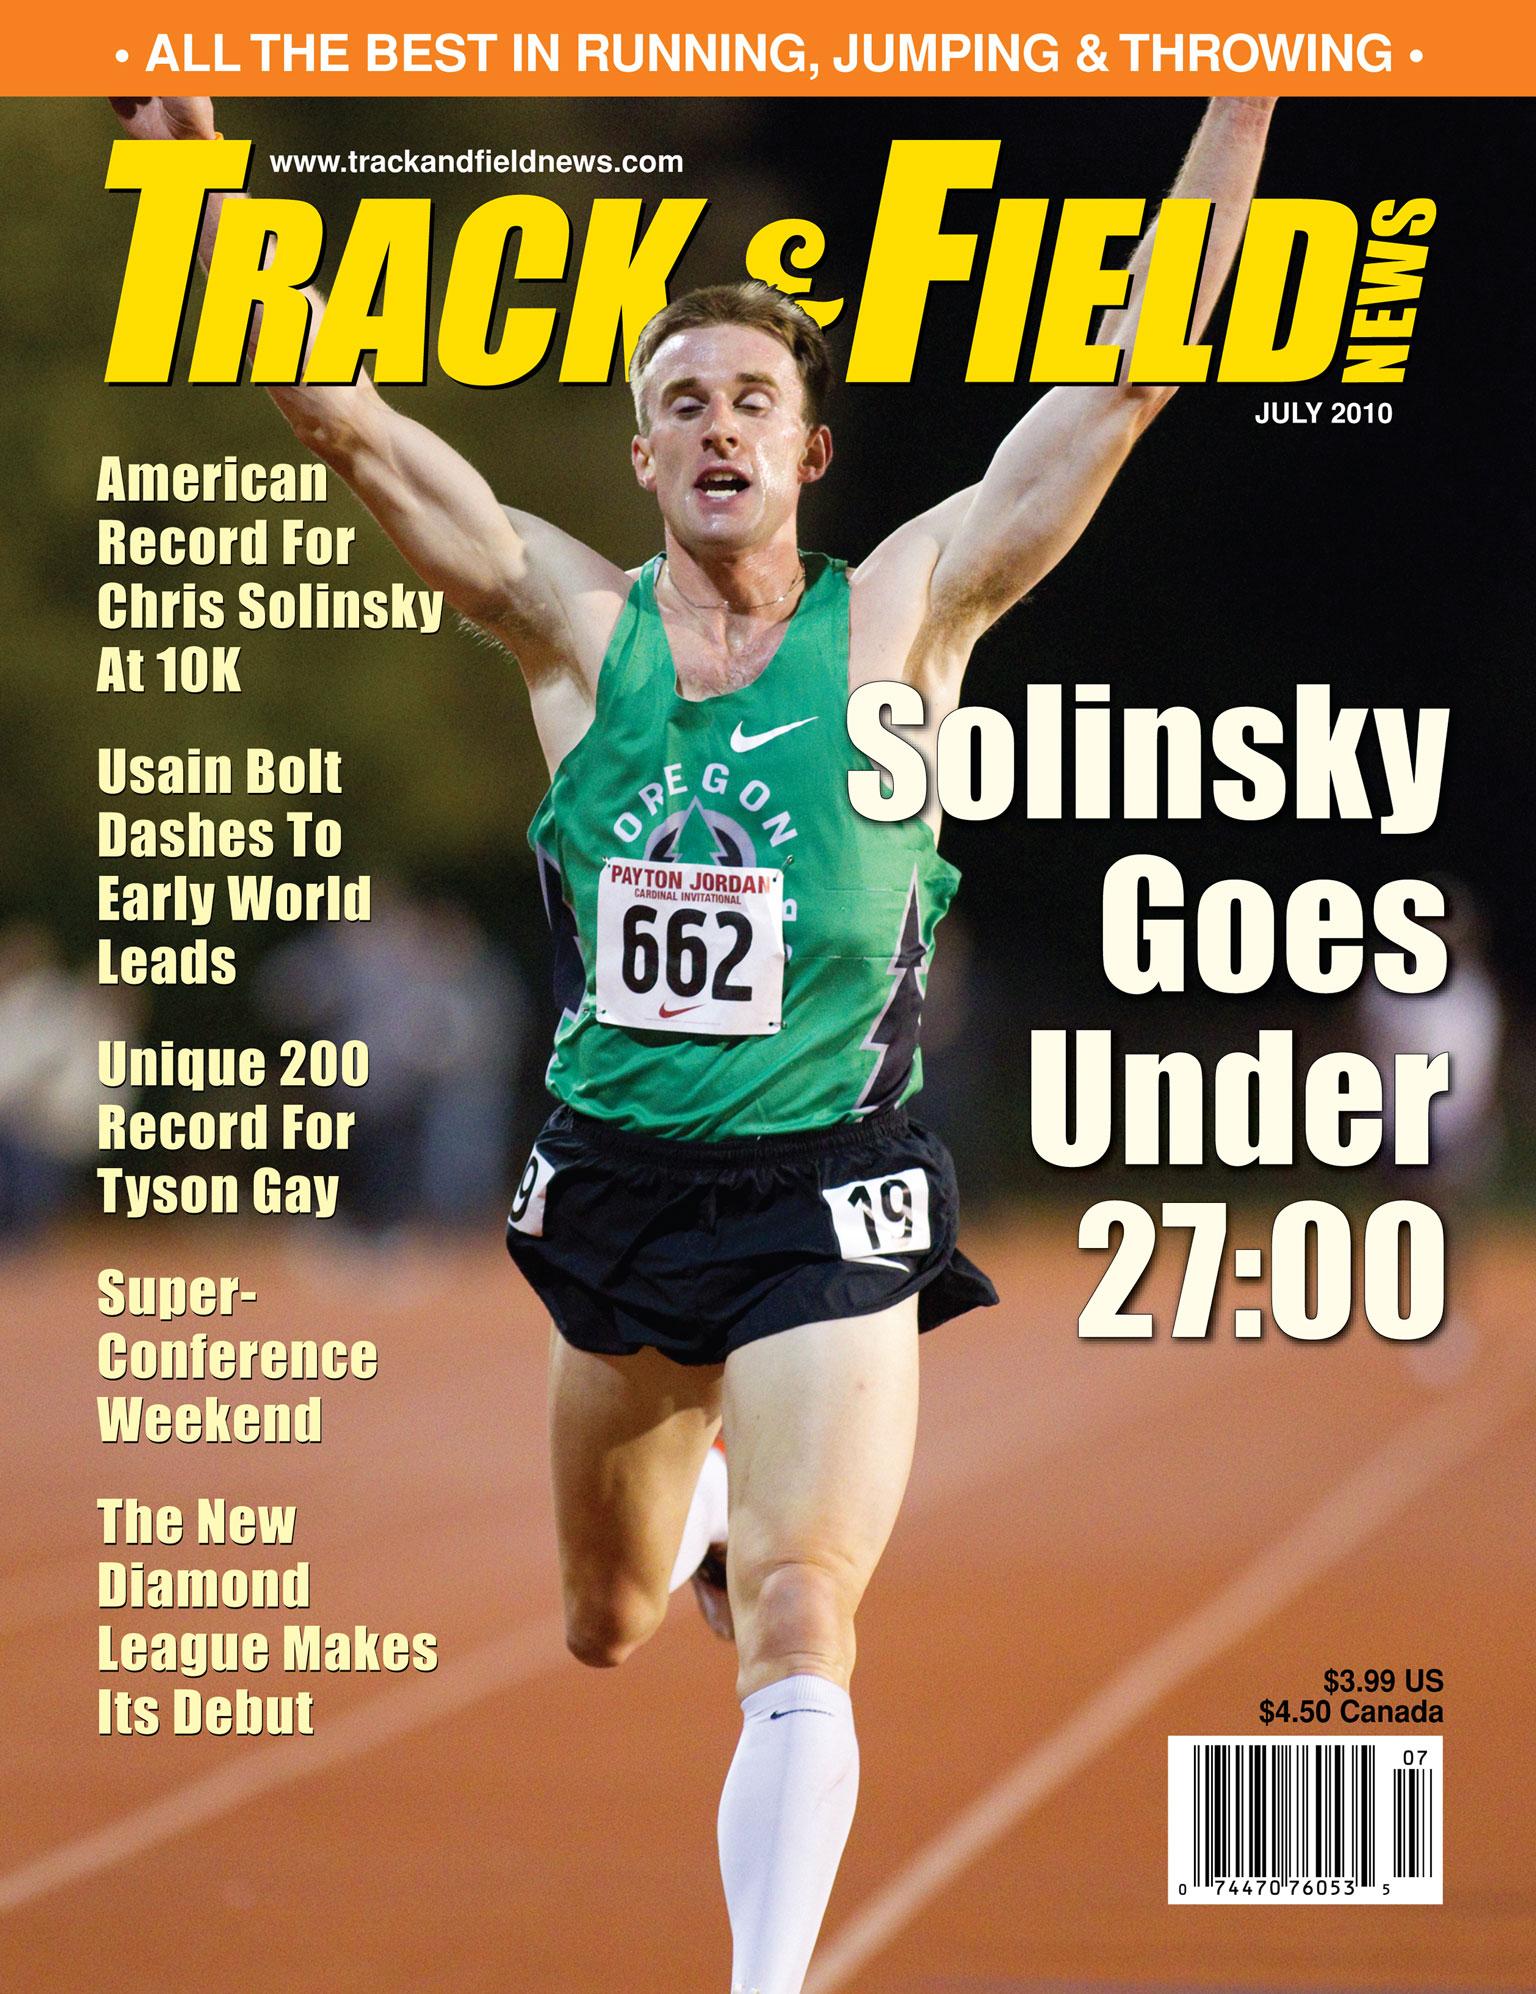 2010 07 T&FN Interview Reboot — Chris Solinsky (July 2010)